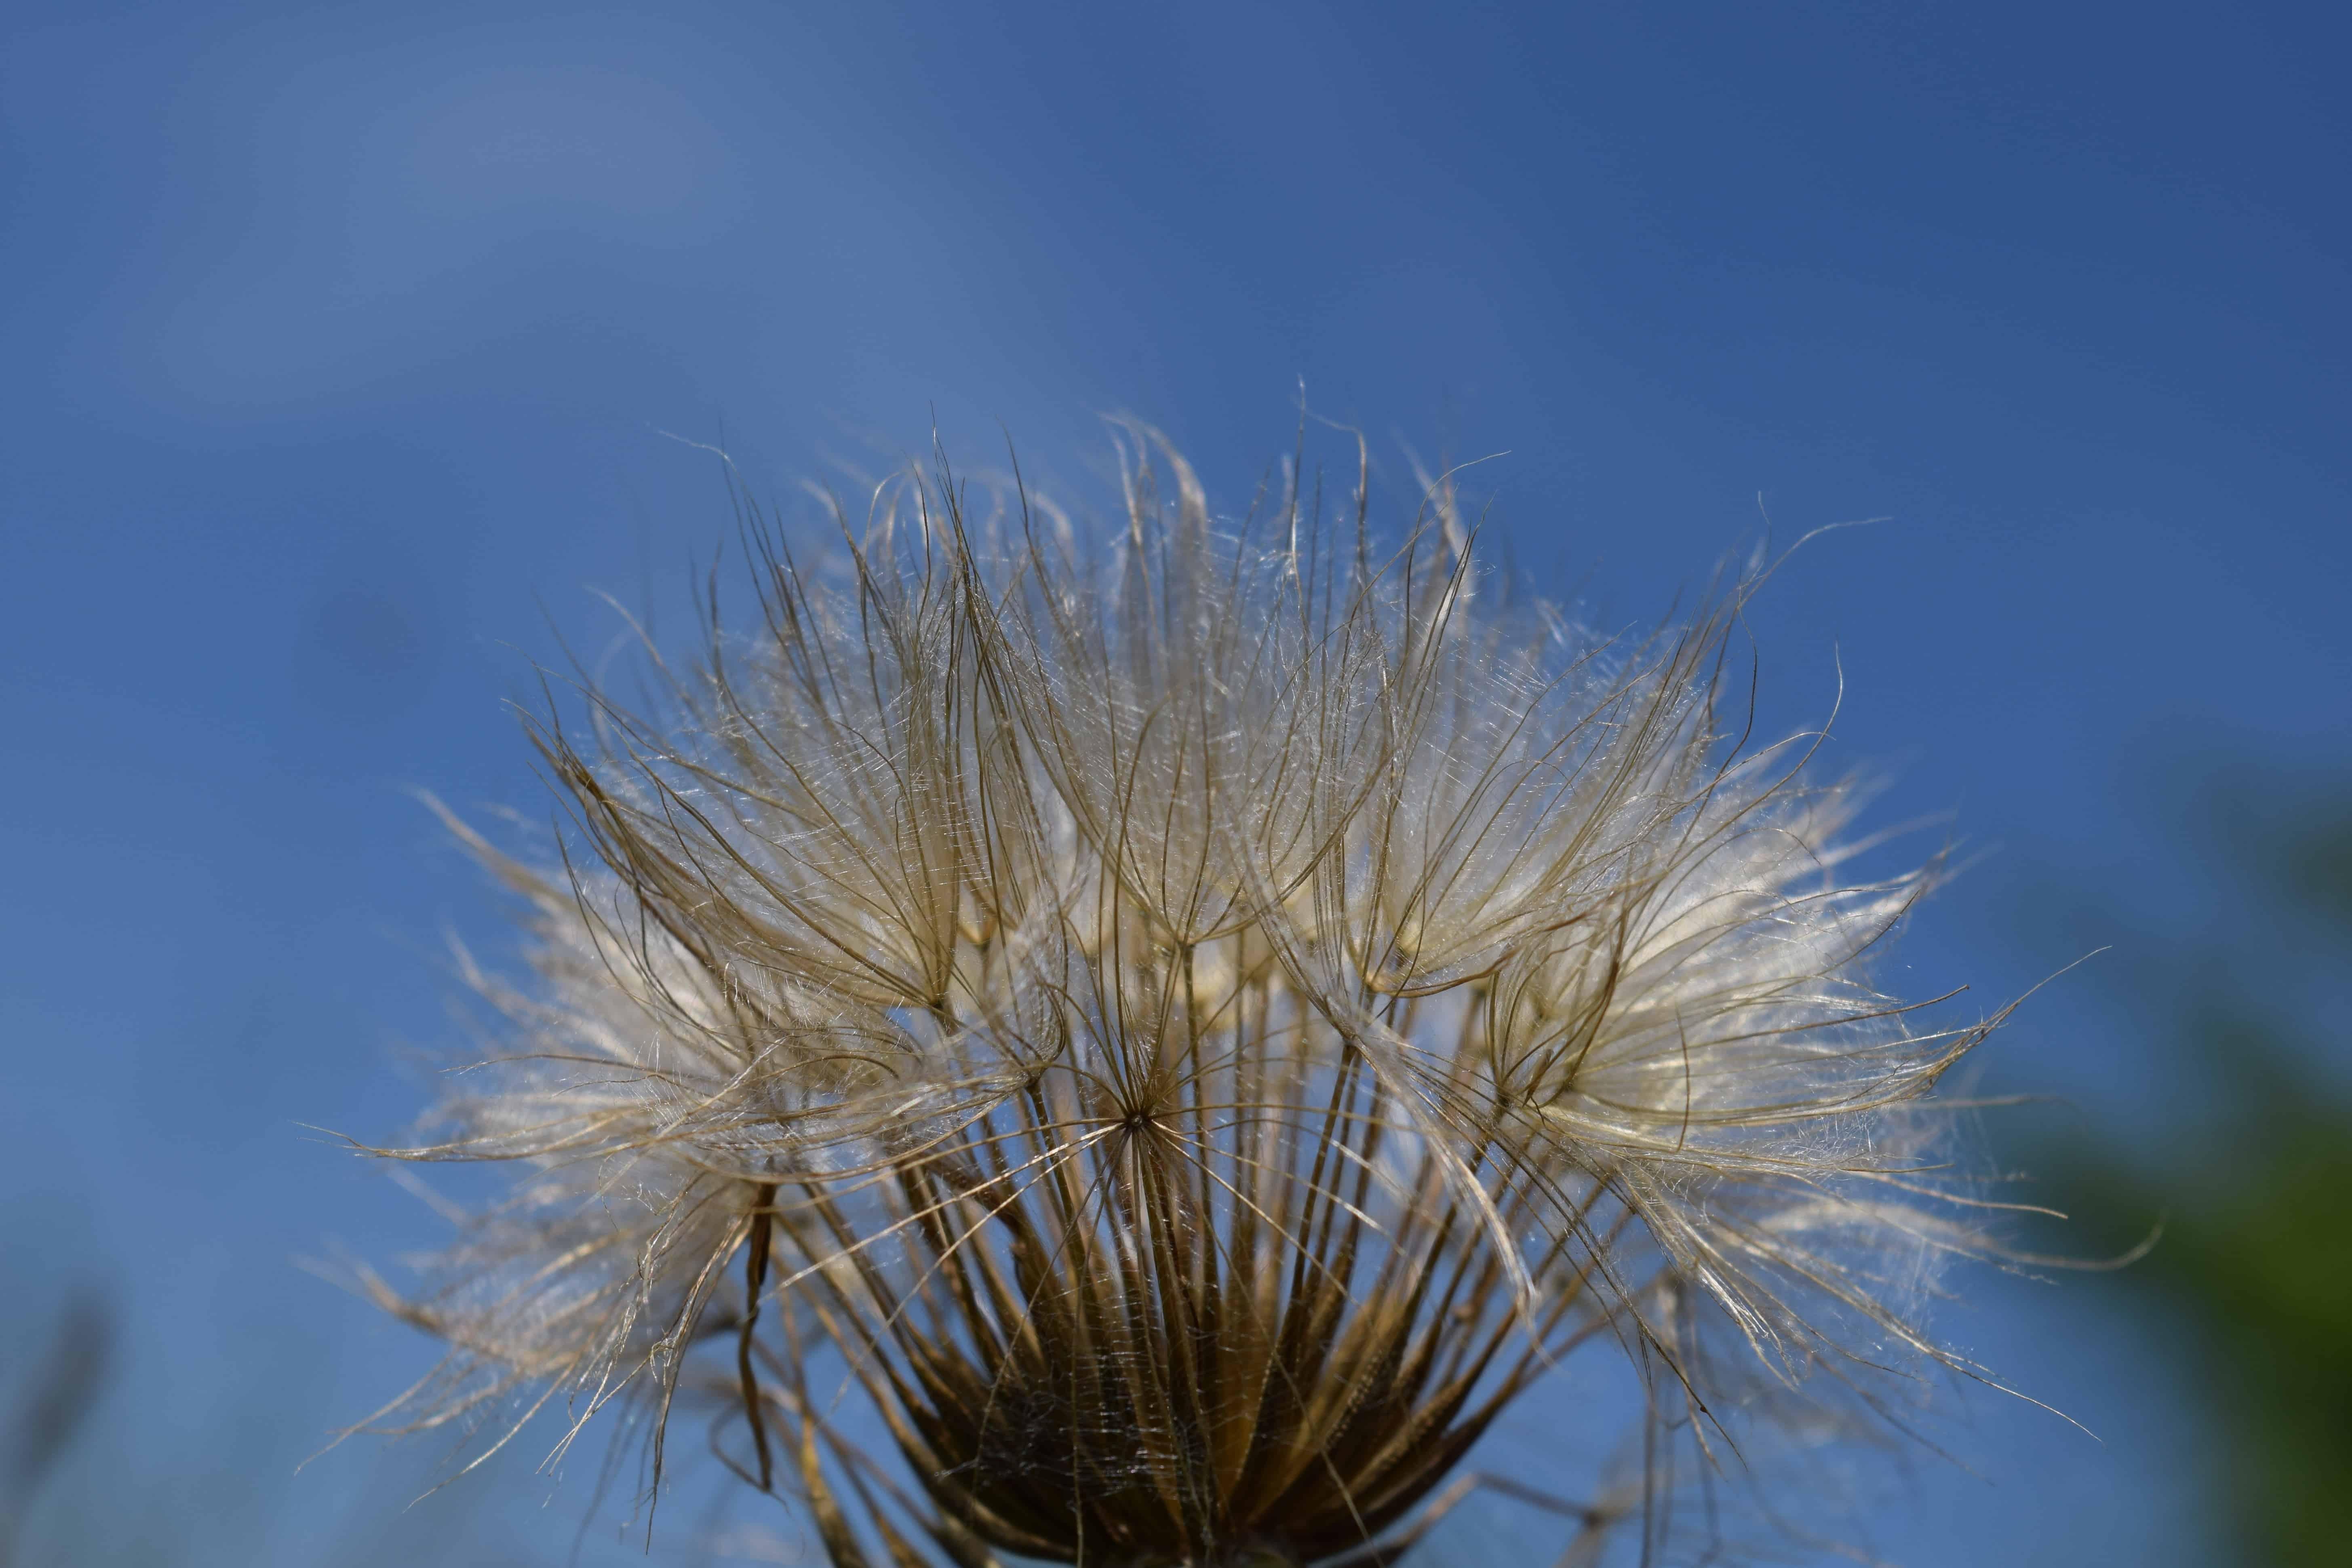 free picture: dandelion, flower, blue sky, summer, flora, nature